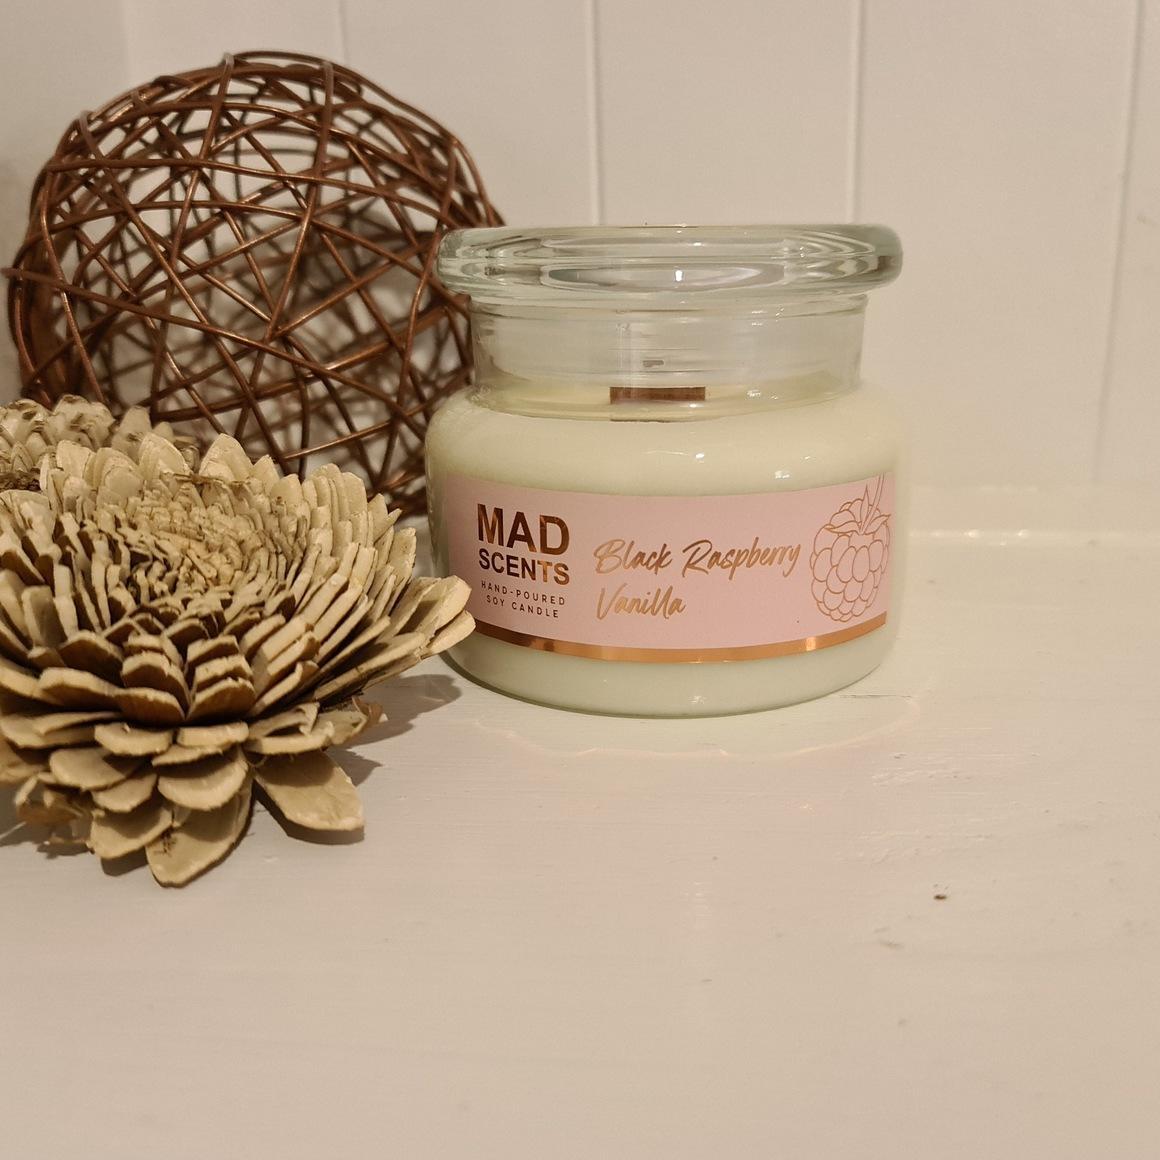 Black Raspberry Vanilla wood wick candle | Trada Marketplace